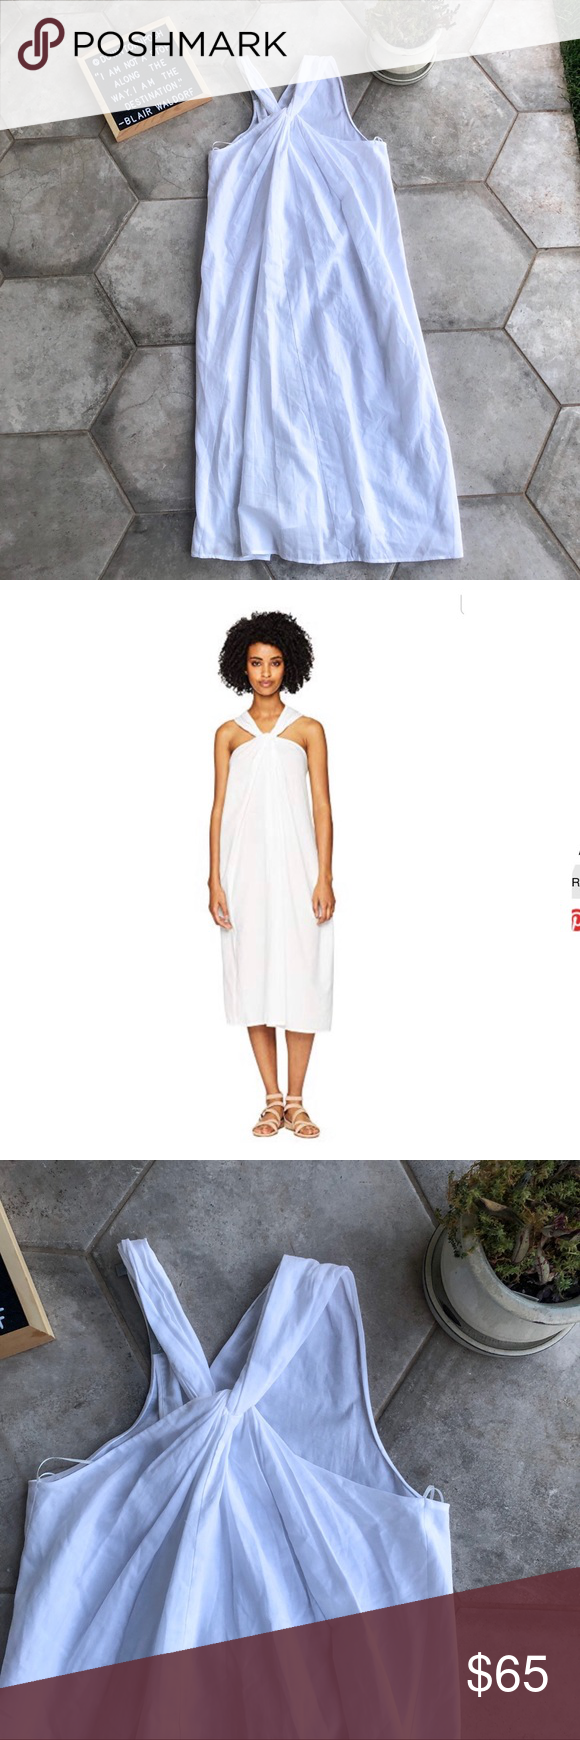 Vince Halter Twist White Dress Dresses White Dress Vince Dress [ 1740 x 580 Pixel ]